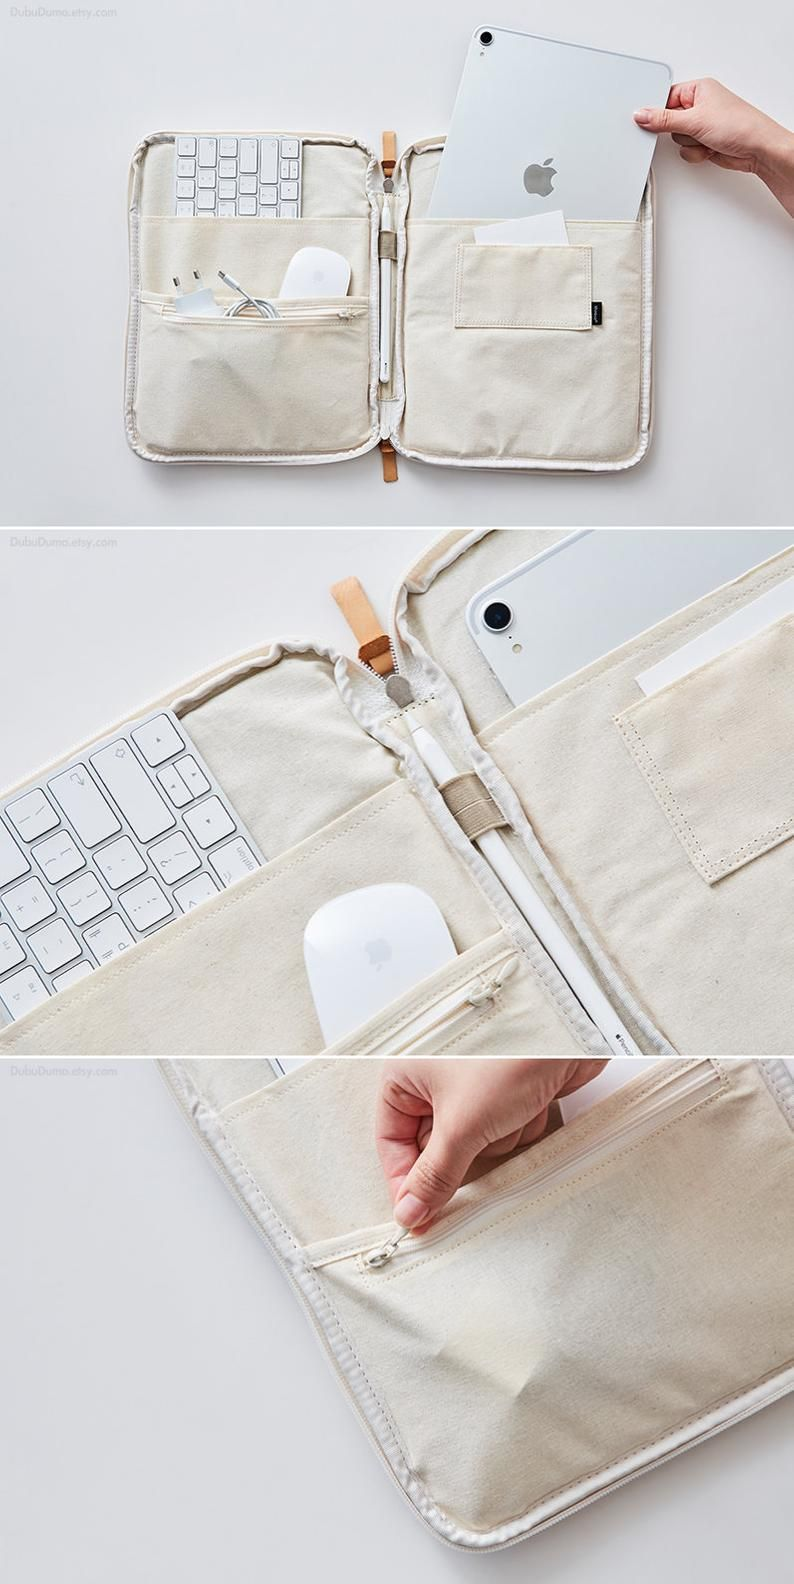 11 Ipad Case 3types Canvas Ipad Pro Case 10 5 Tablet Case Tablet Sleeve Ipad Pouch Ipad Cover School Supplies Office Supplies Ipad Pro Case Ipad Case Stickers Ipad Pro Accessories